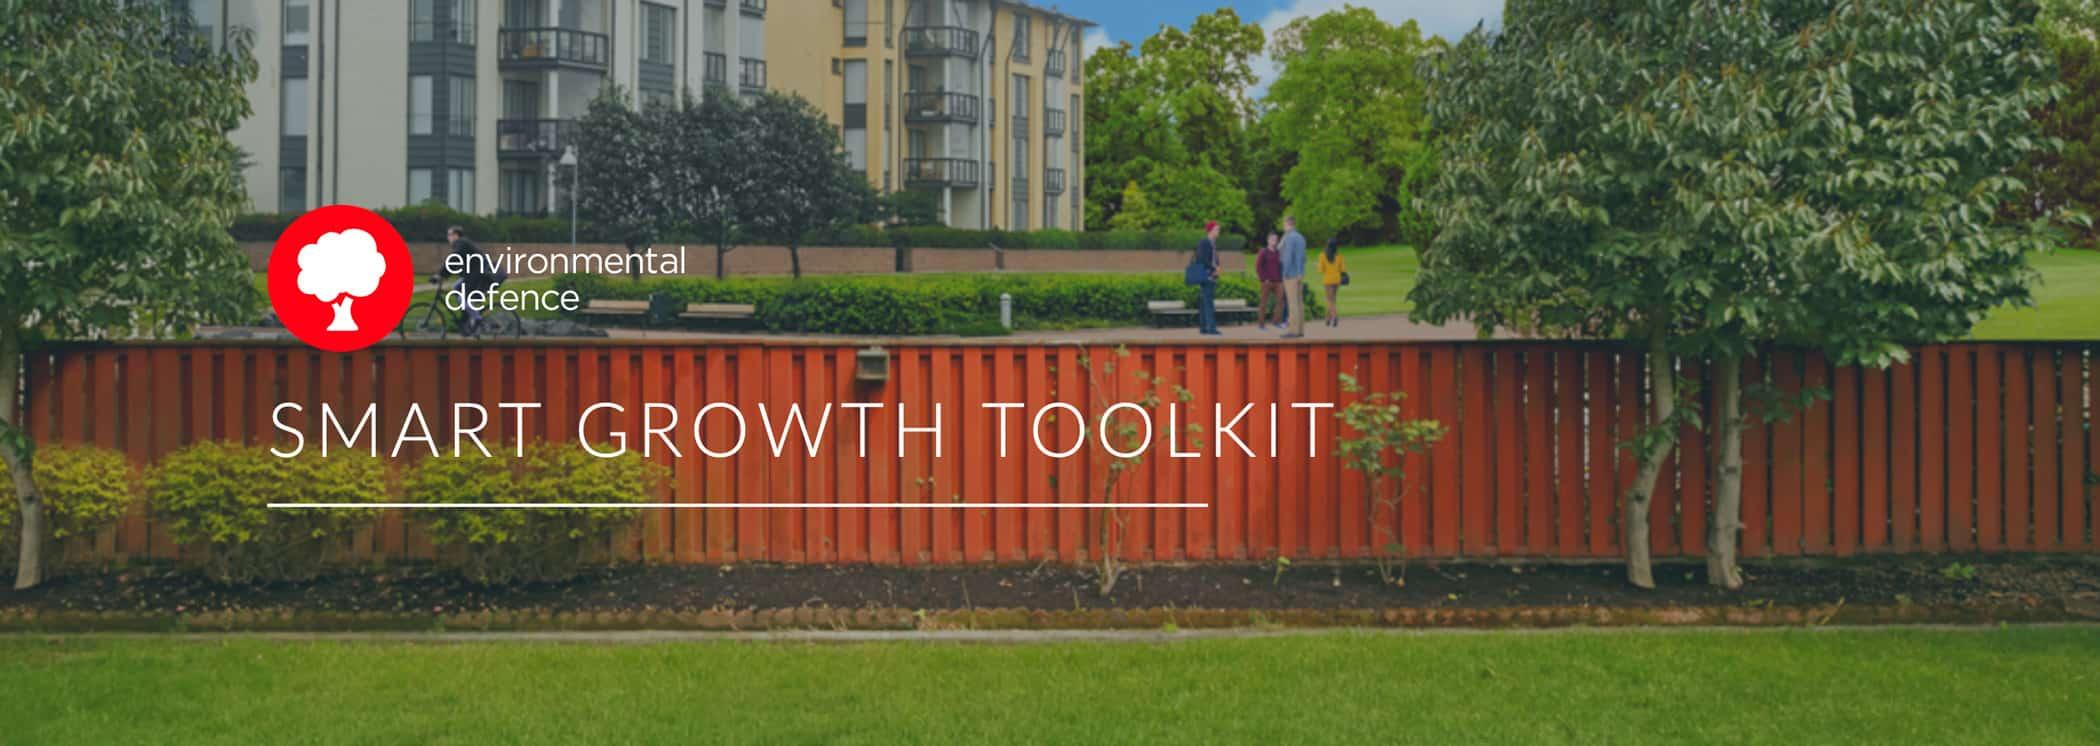 Smart Growth Toolkit